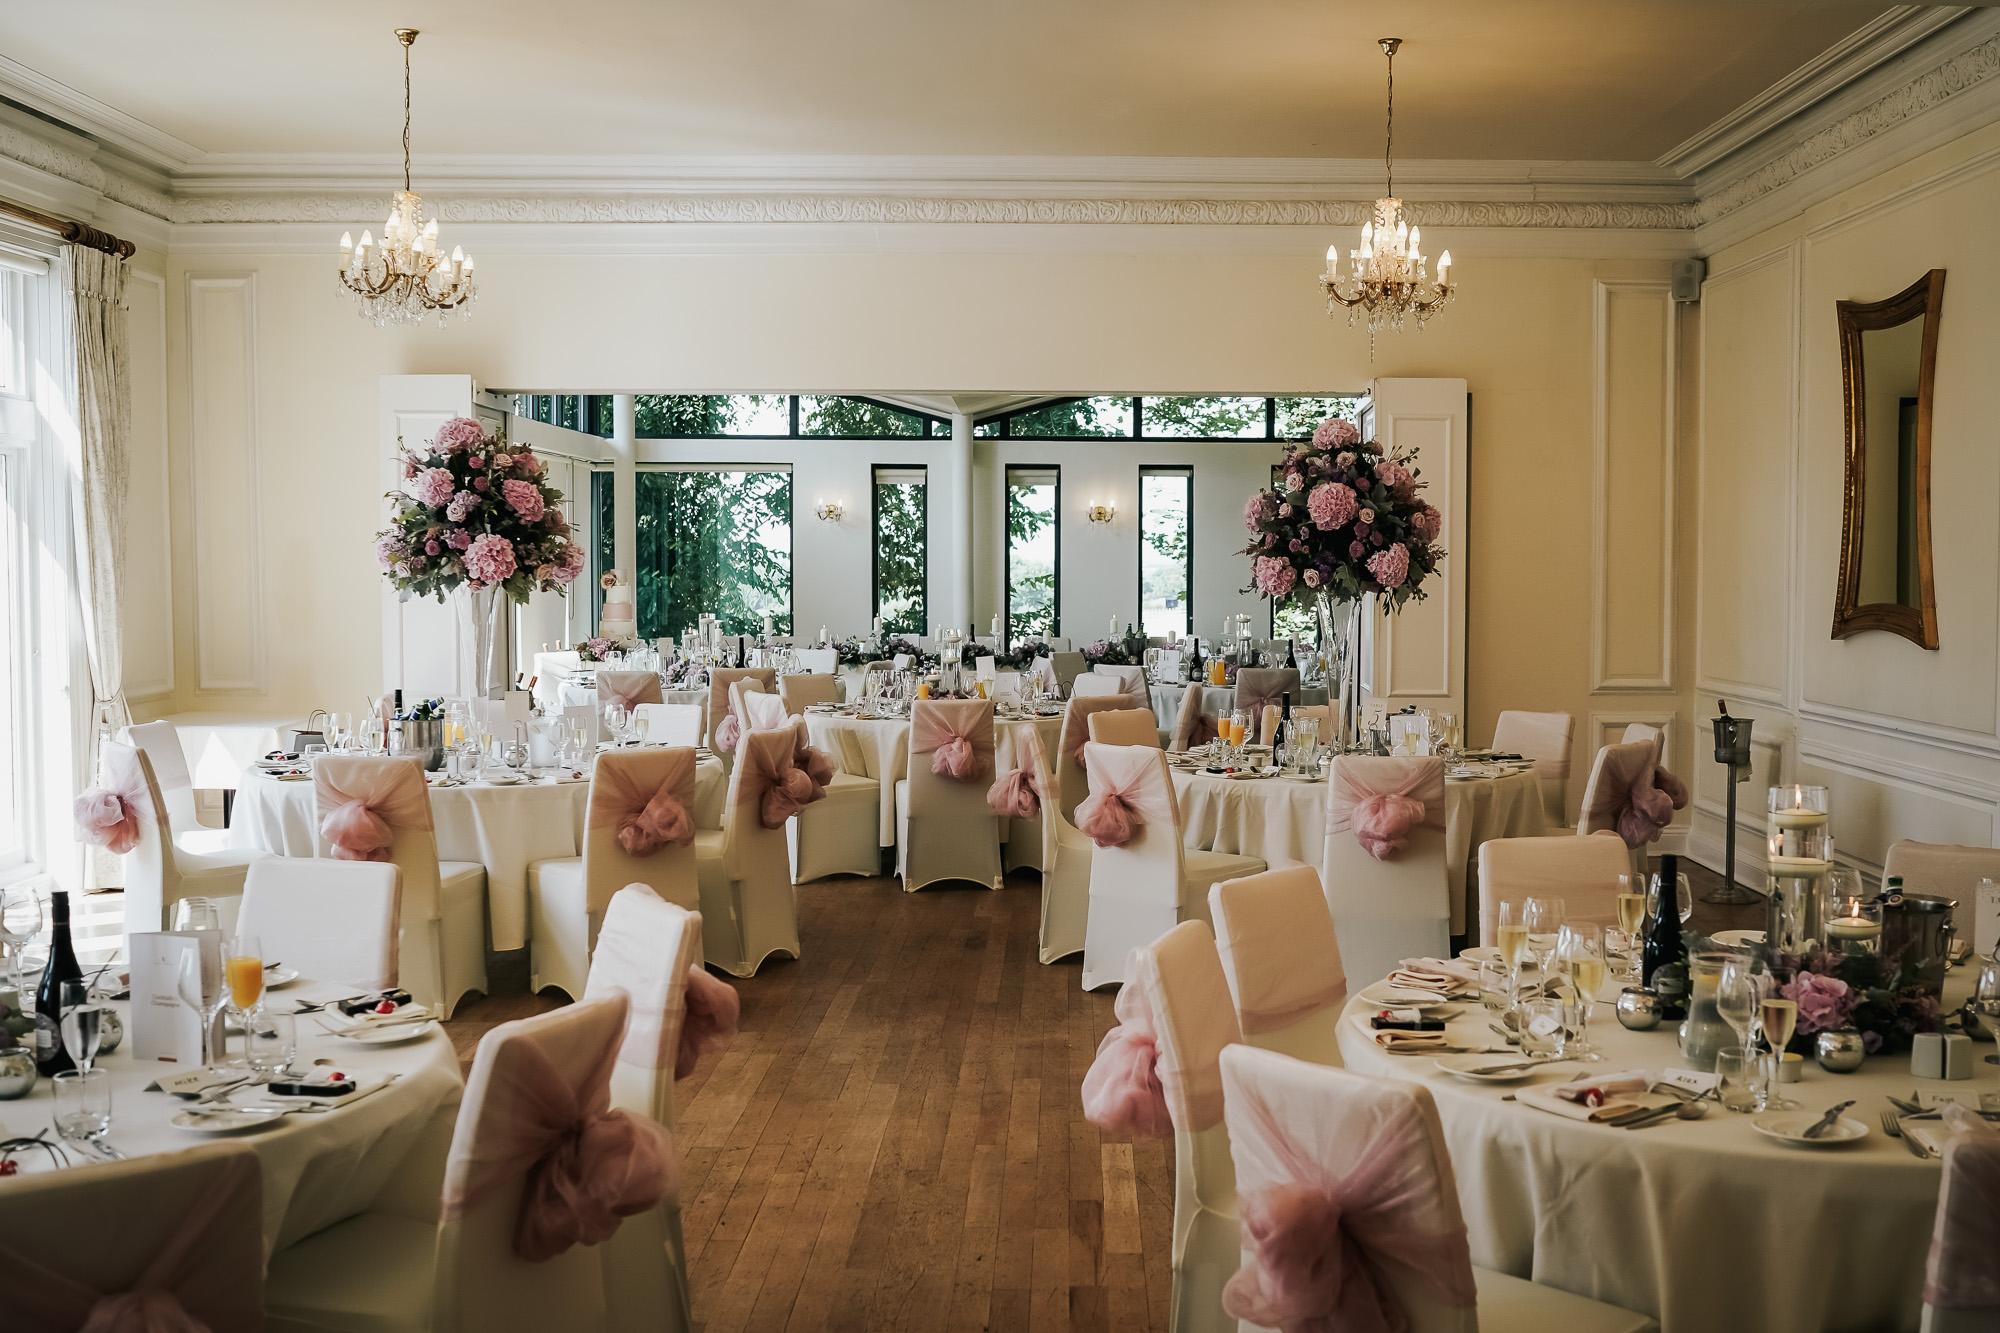 West Tower Wedding Venue Orkskirk Lancashire Wedding Photography cheshire wedding photographer (28 of 47).jpg